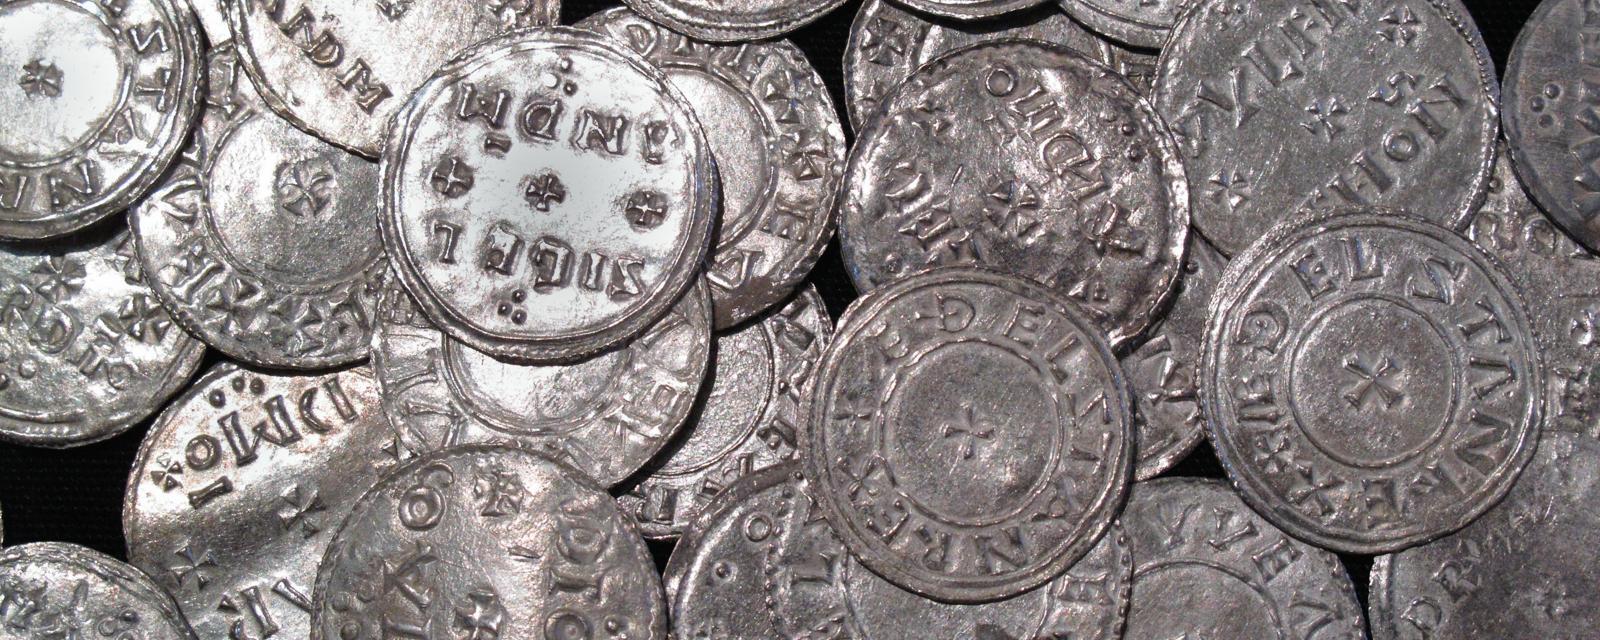 Nine surprising things worth more than this shimmering metal